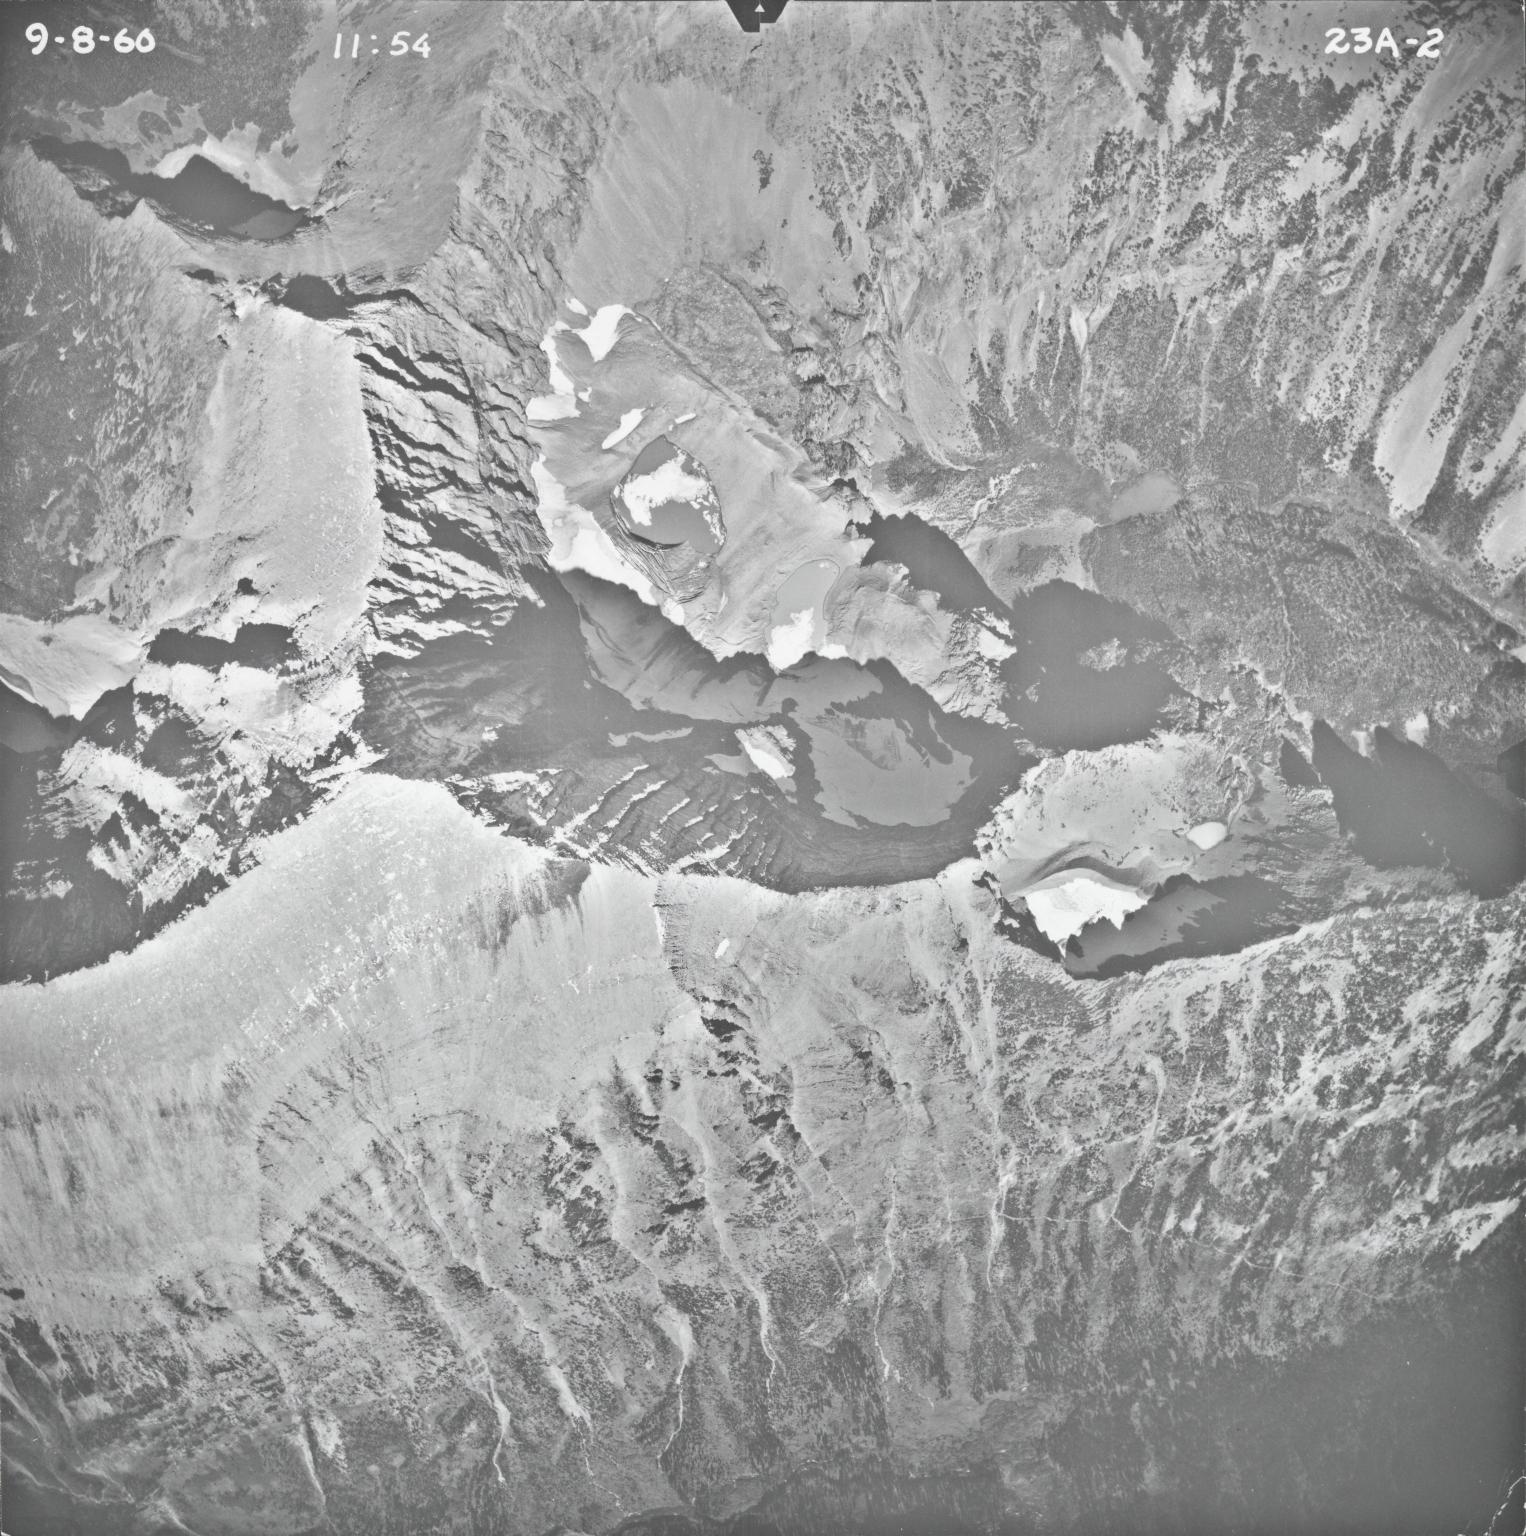 Mount James, aerial photograph 23A-2, Montana